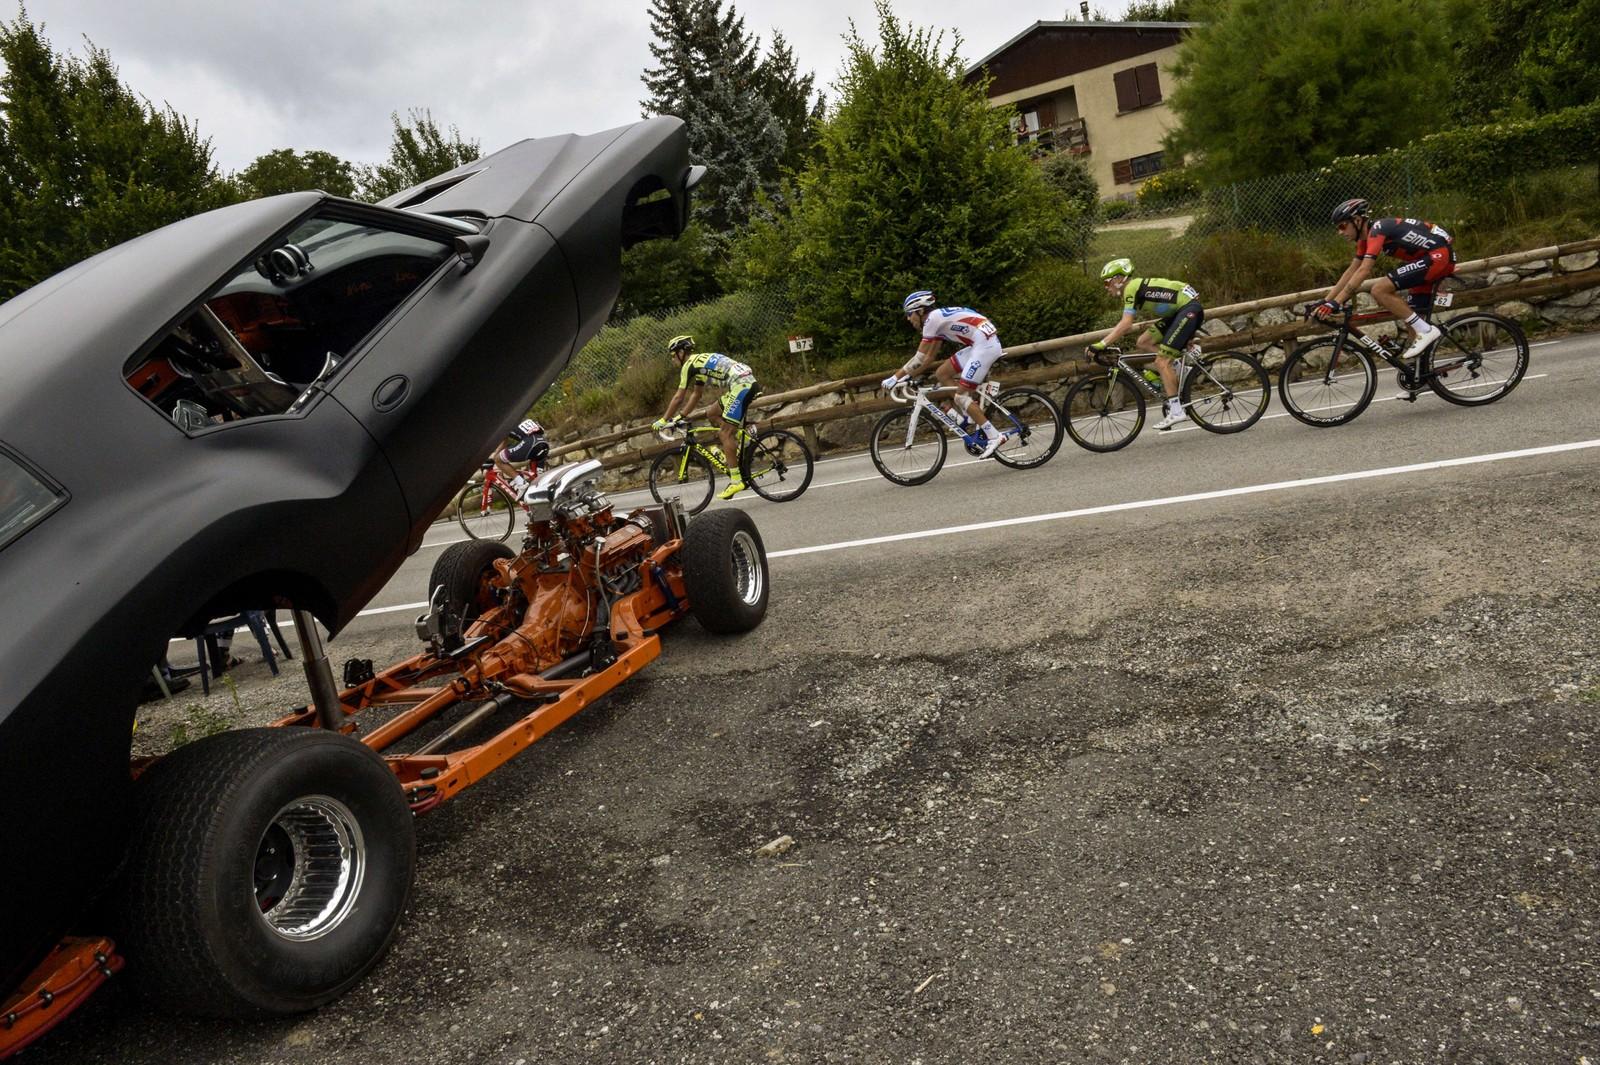 Man får se mye rart langs veien når man er Tour de France-rytter. AFP PHOTO / LIONEL BONAVENTURE 560076731